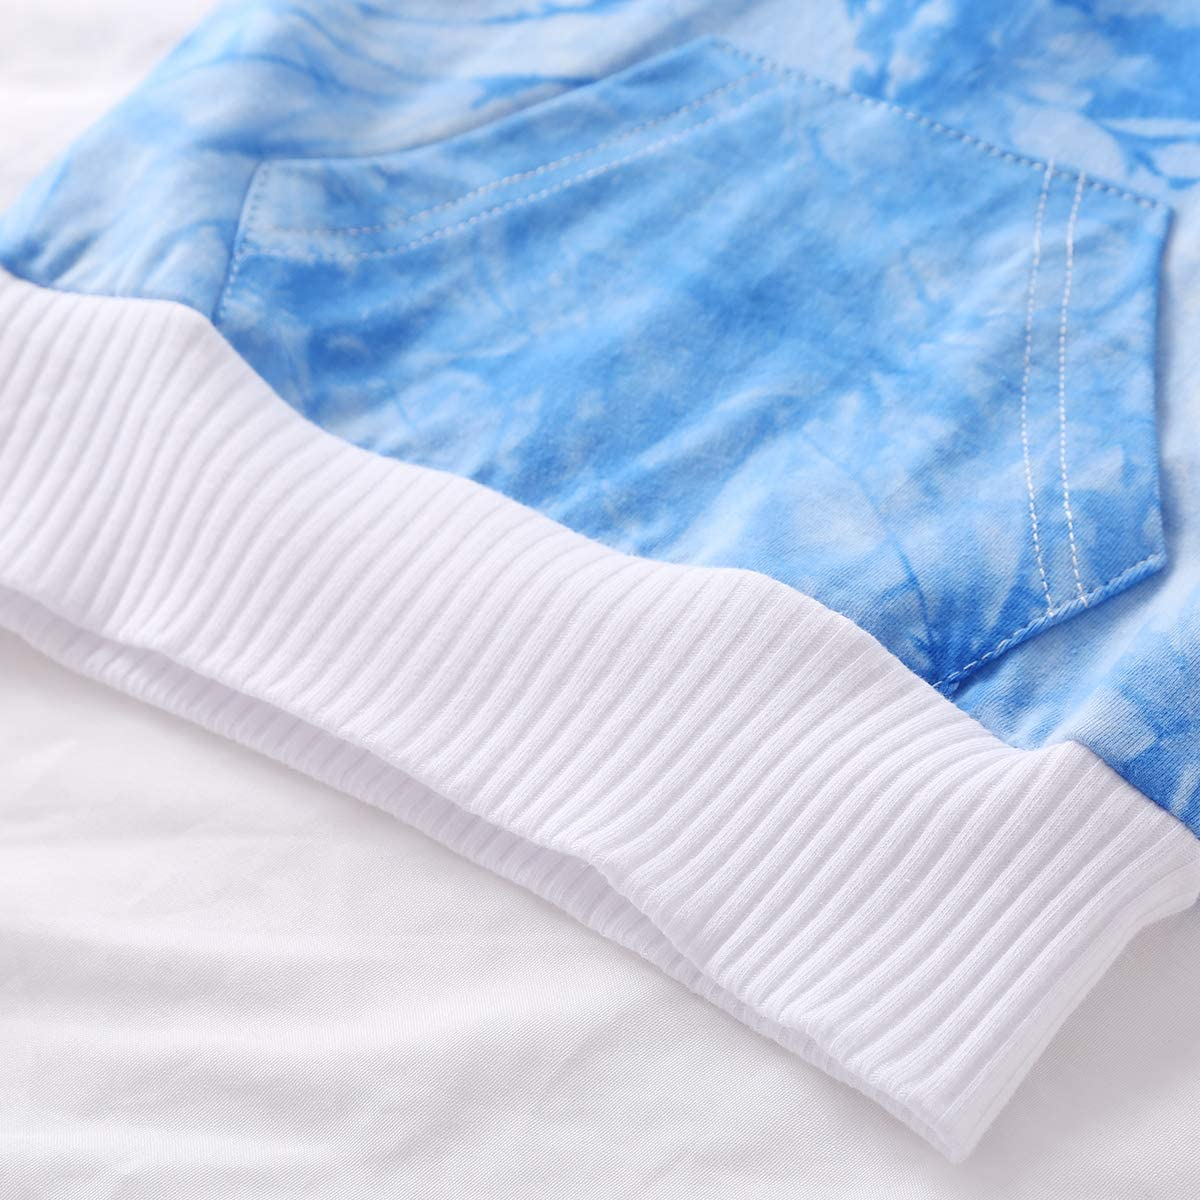 Diadema Multicolores para Ni/ña 0-24 Meses Pantalones Largos Conjuntos para Ni/ña Invierno Bodies Manga Larga Tie-Dye